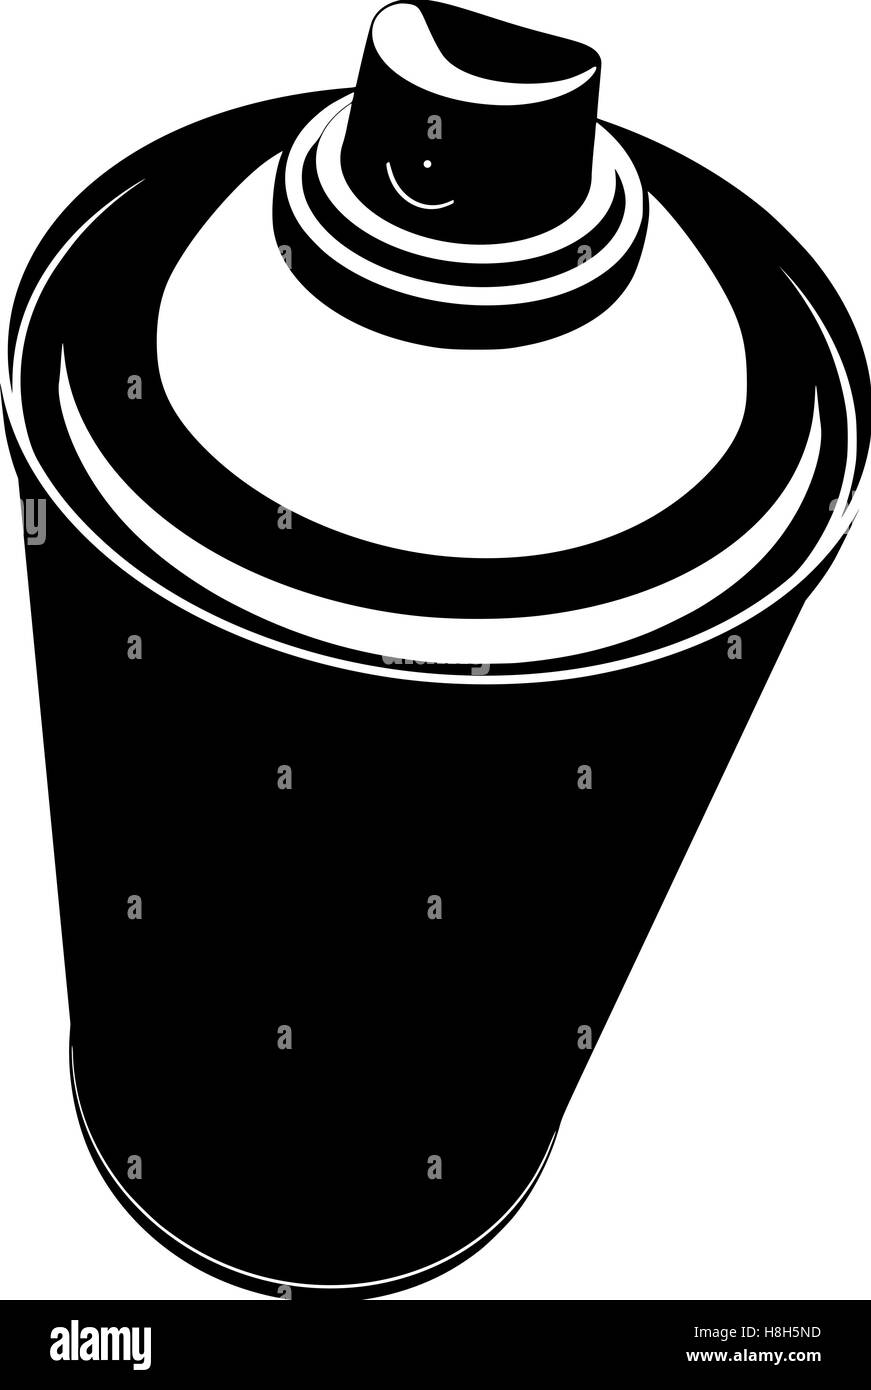 graffiti spraycan illustration in black over white Stock Vector